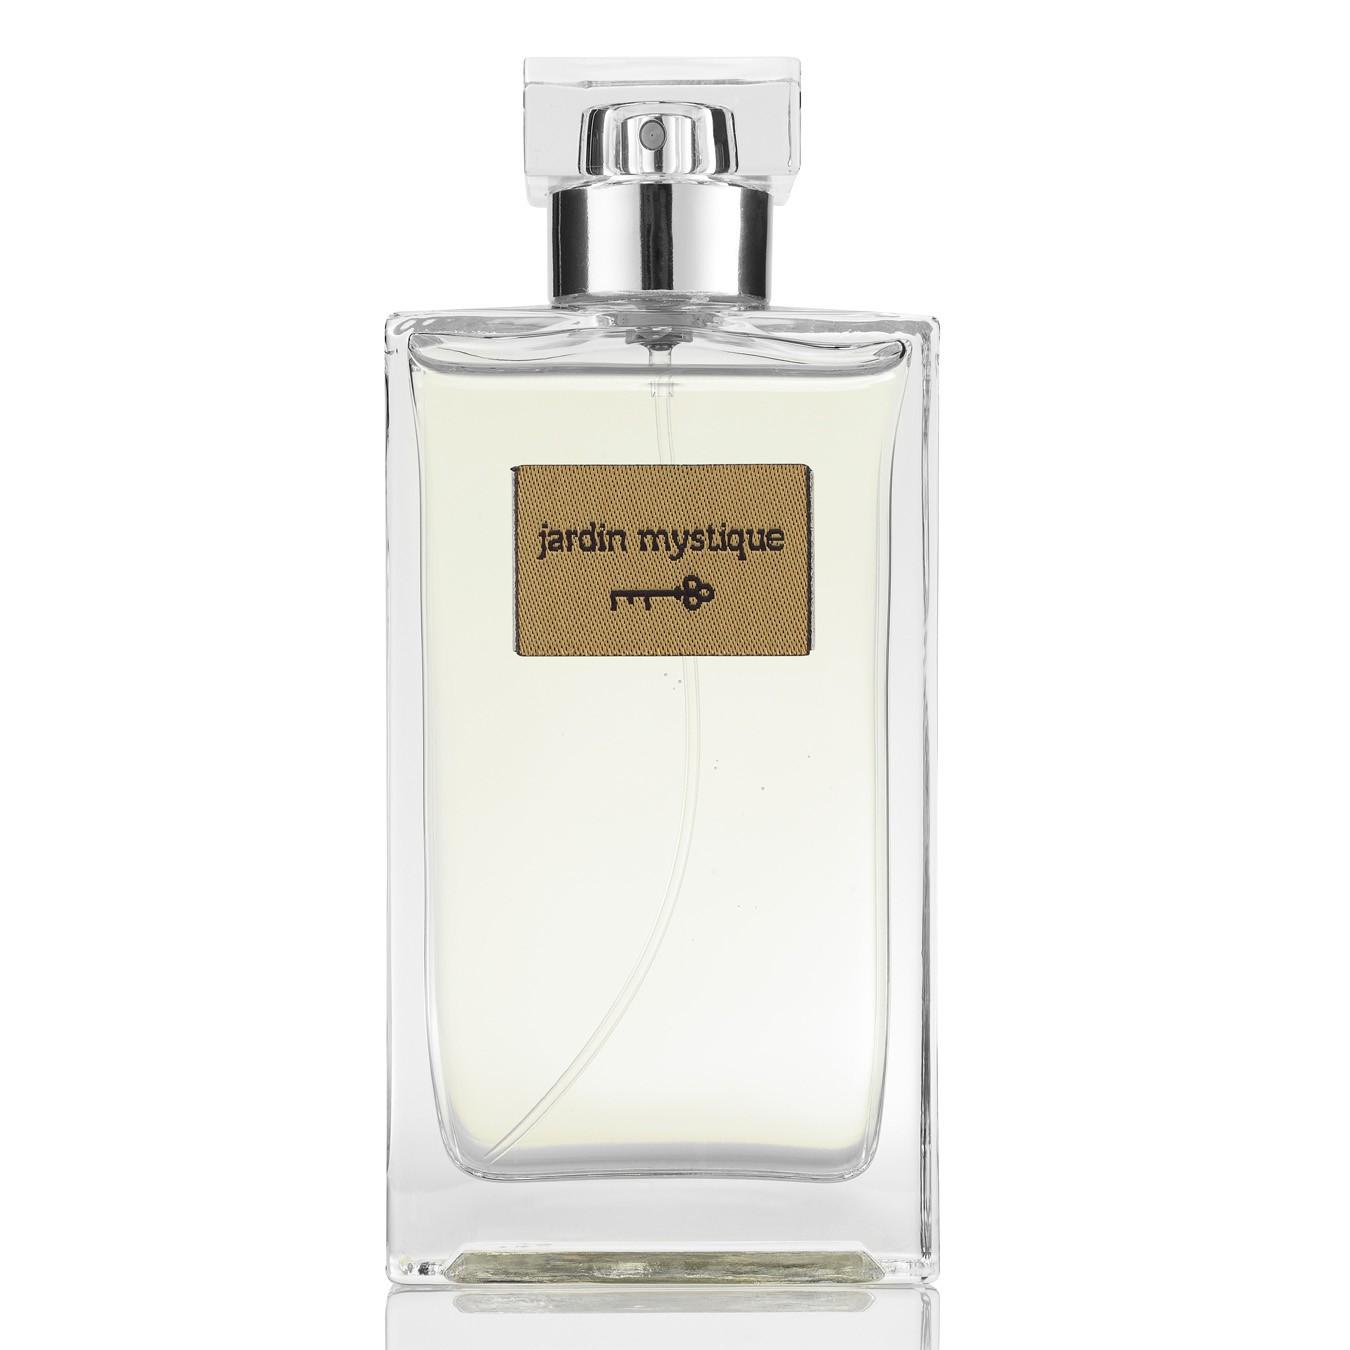 Friedemodin Jardin Mystique аромат для женщин